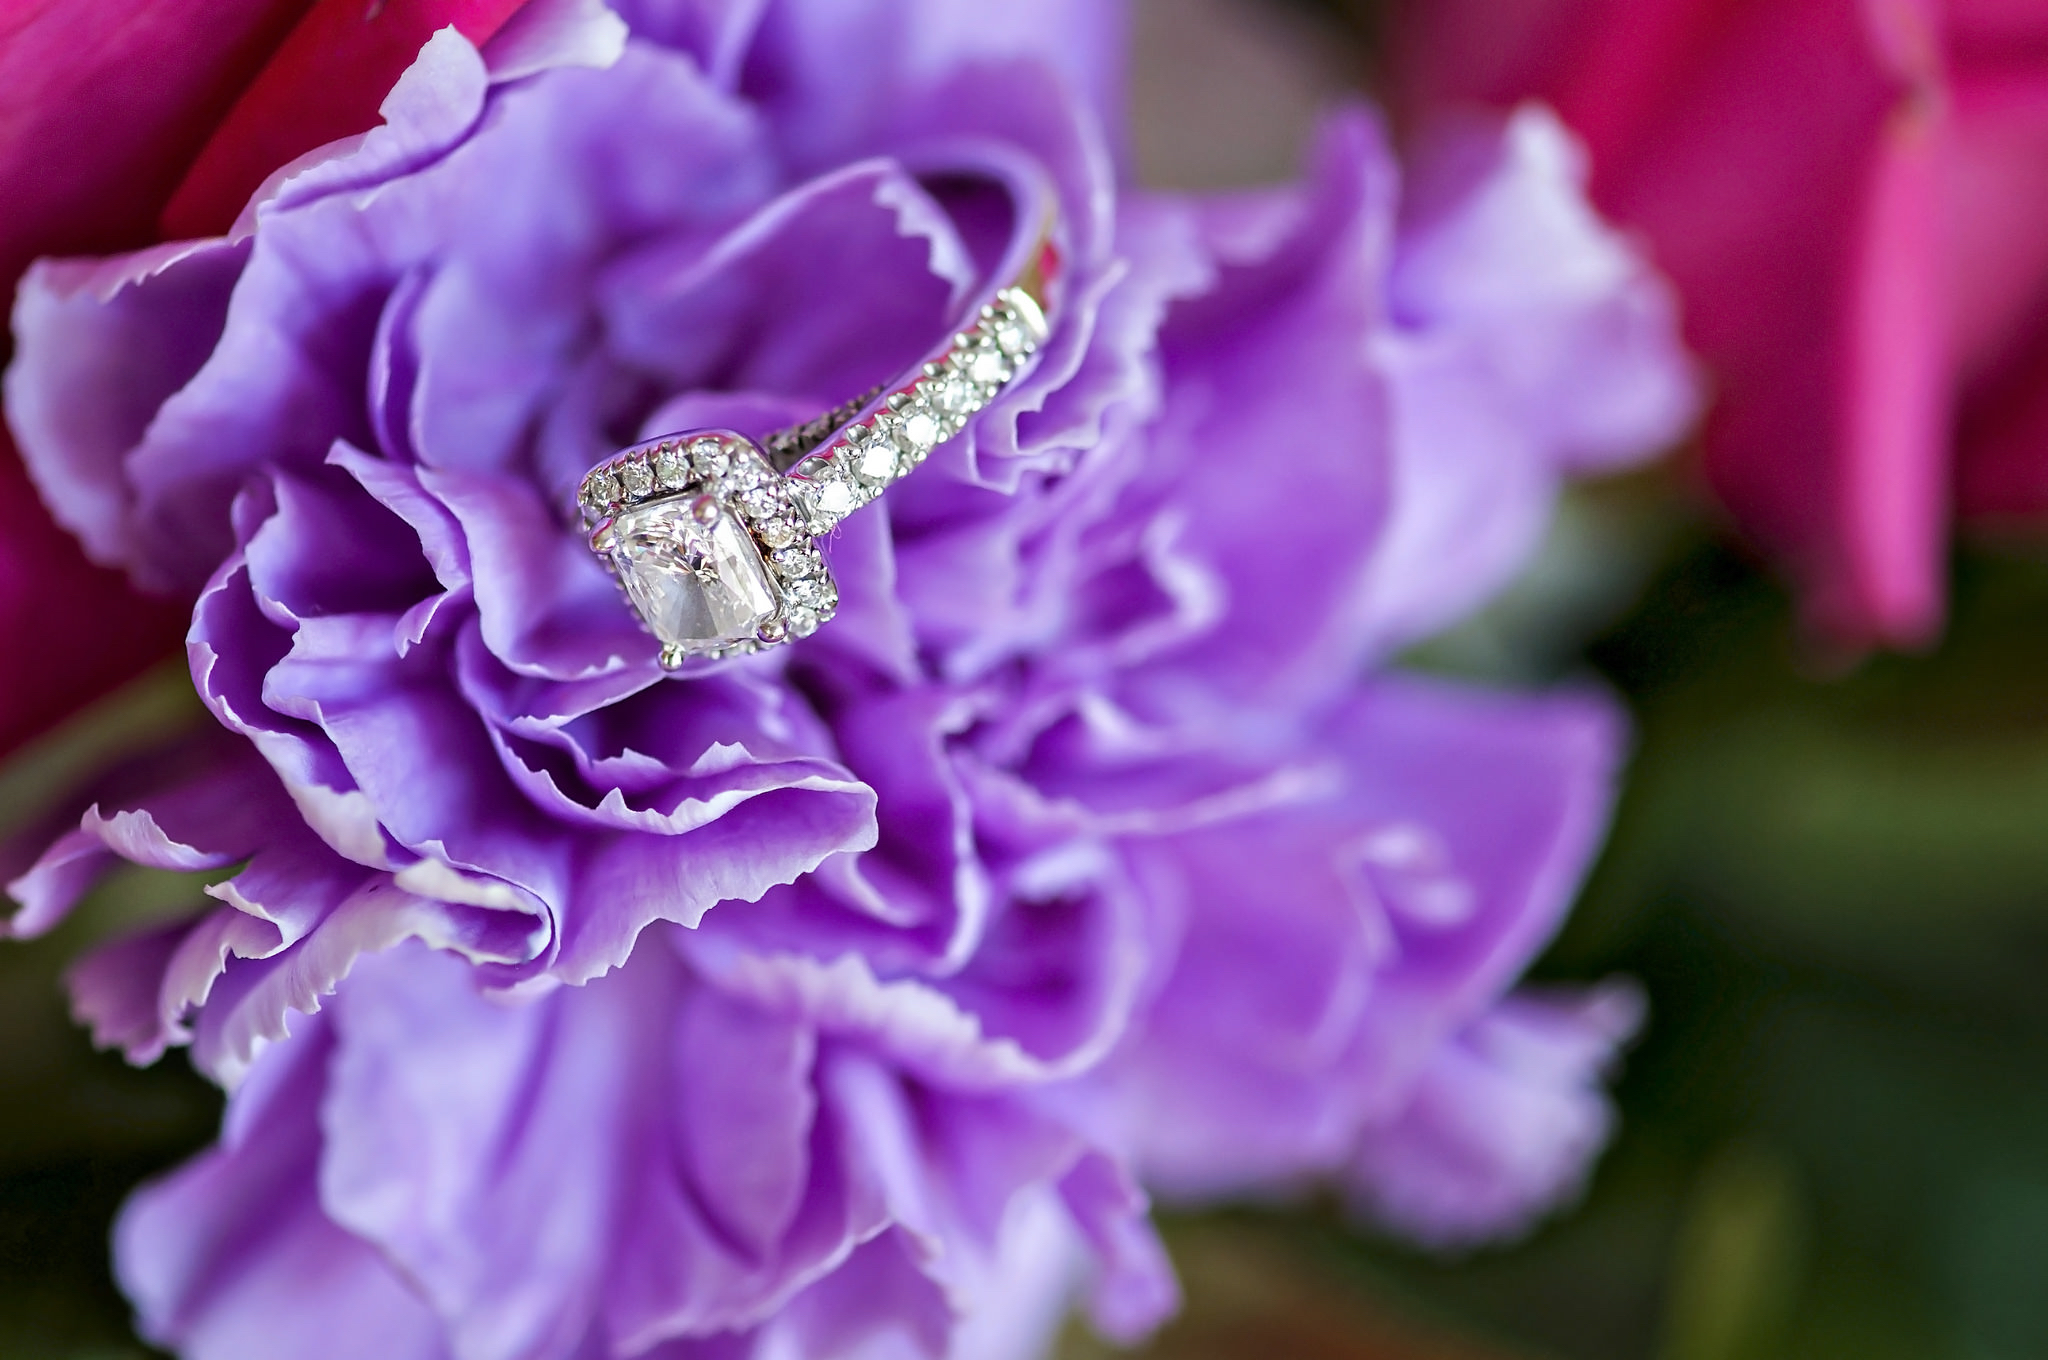 kristine_wedding_rings_spiritedtable_photo09.jpg